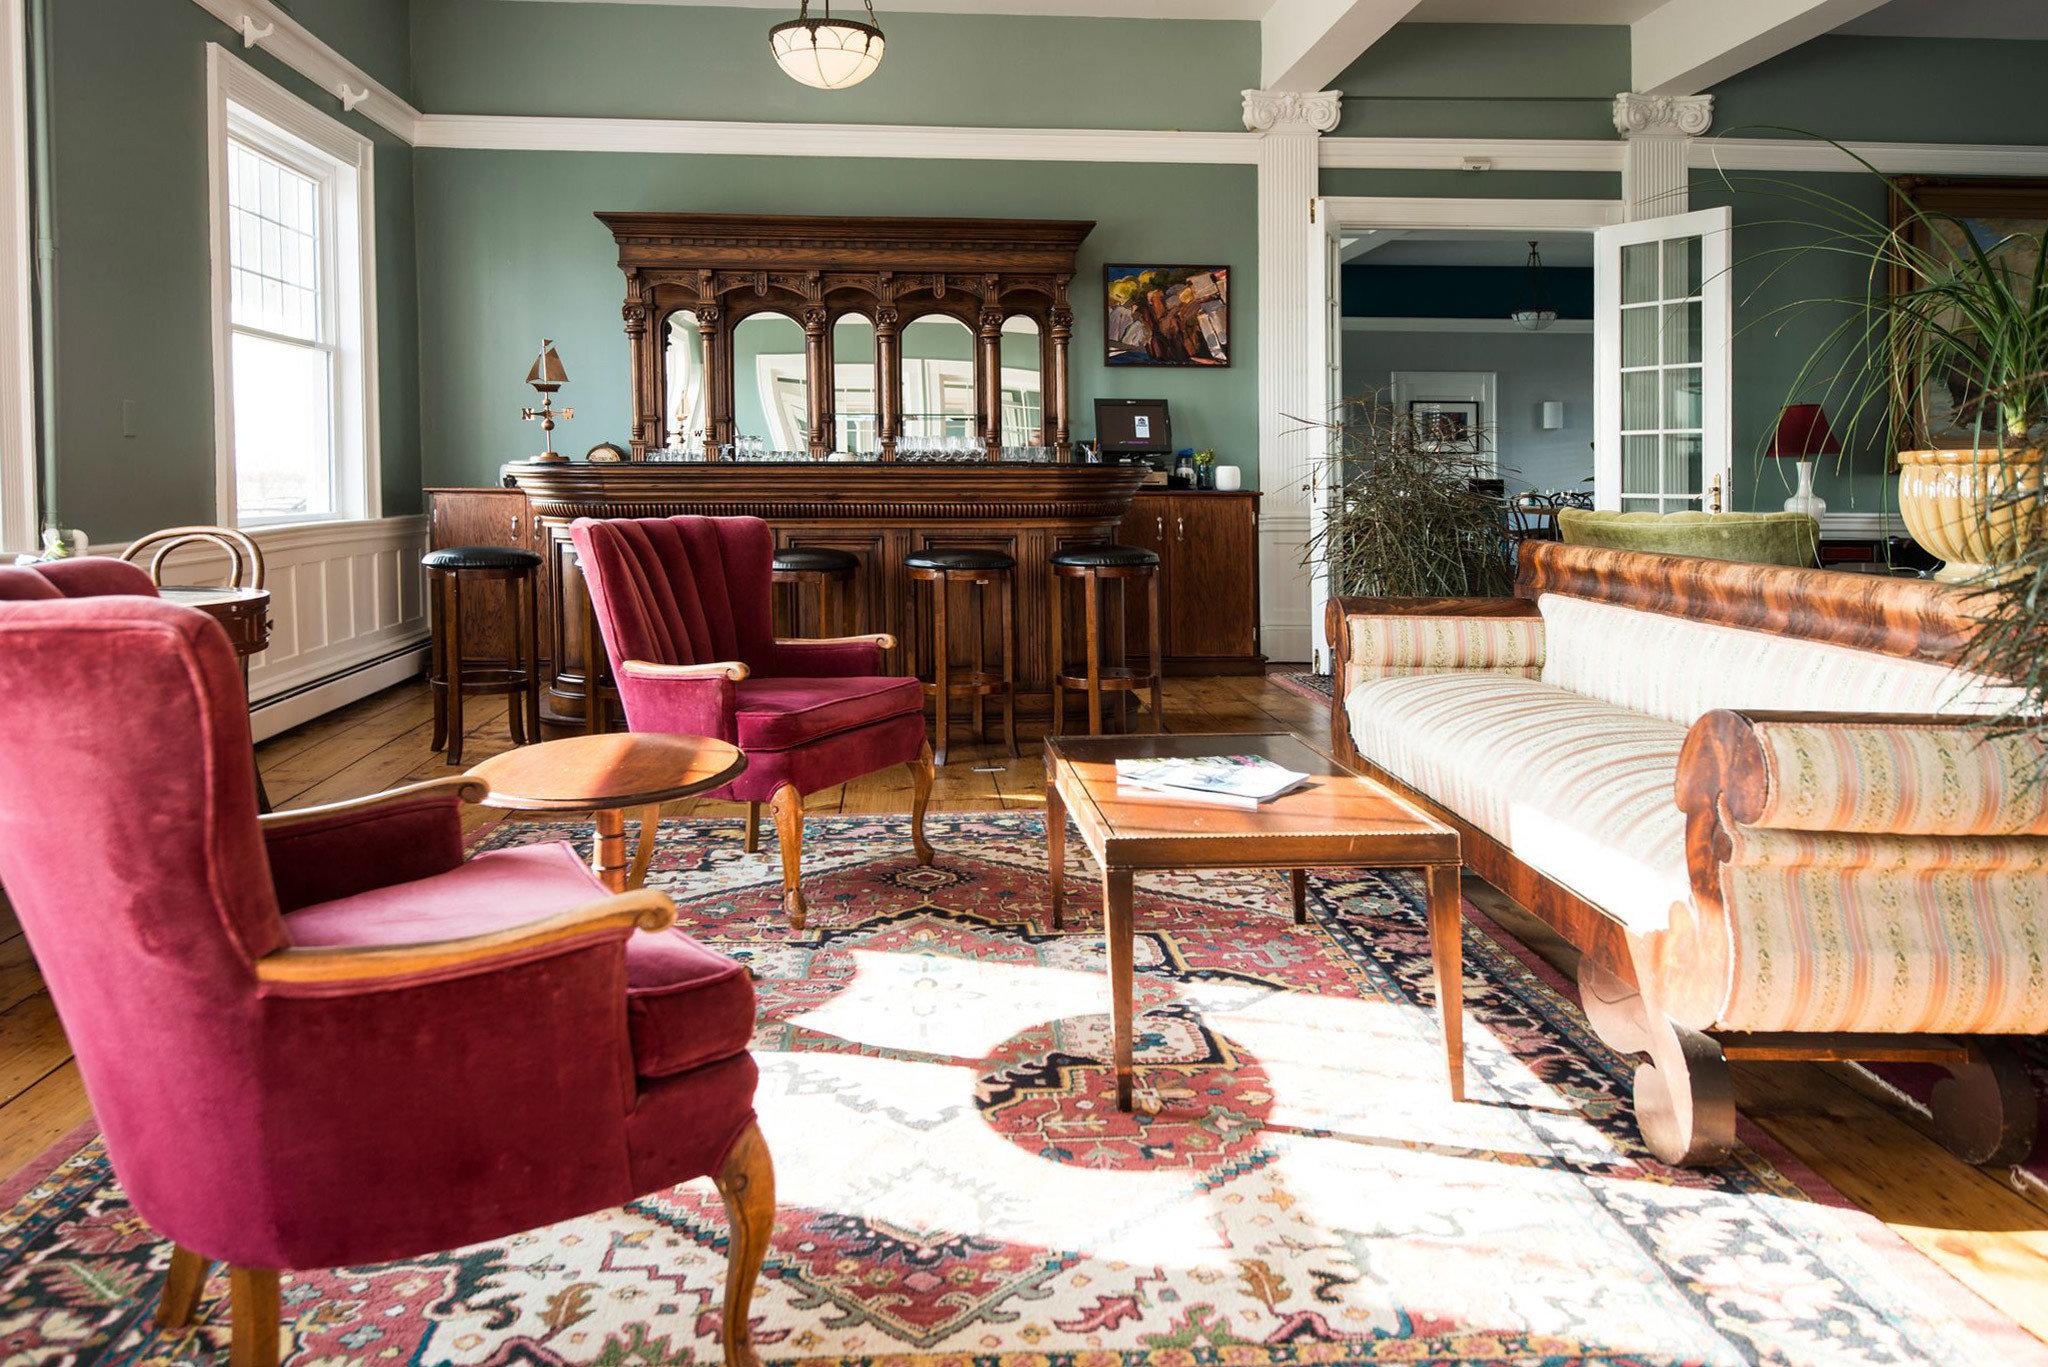 chair property living room home cottage Villa mansion porch Resort Suite farmhouse